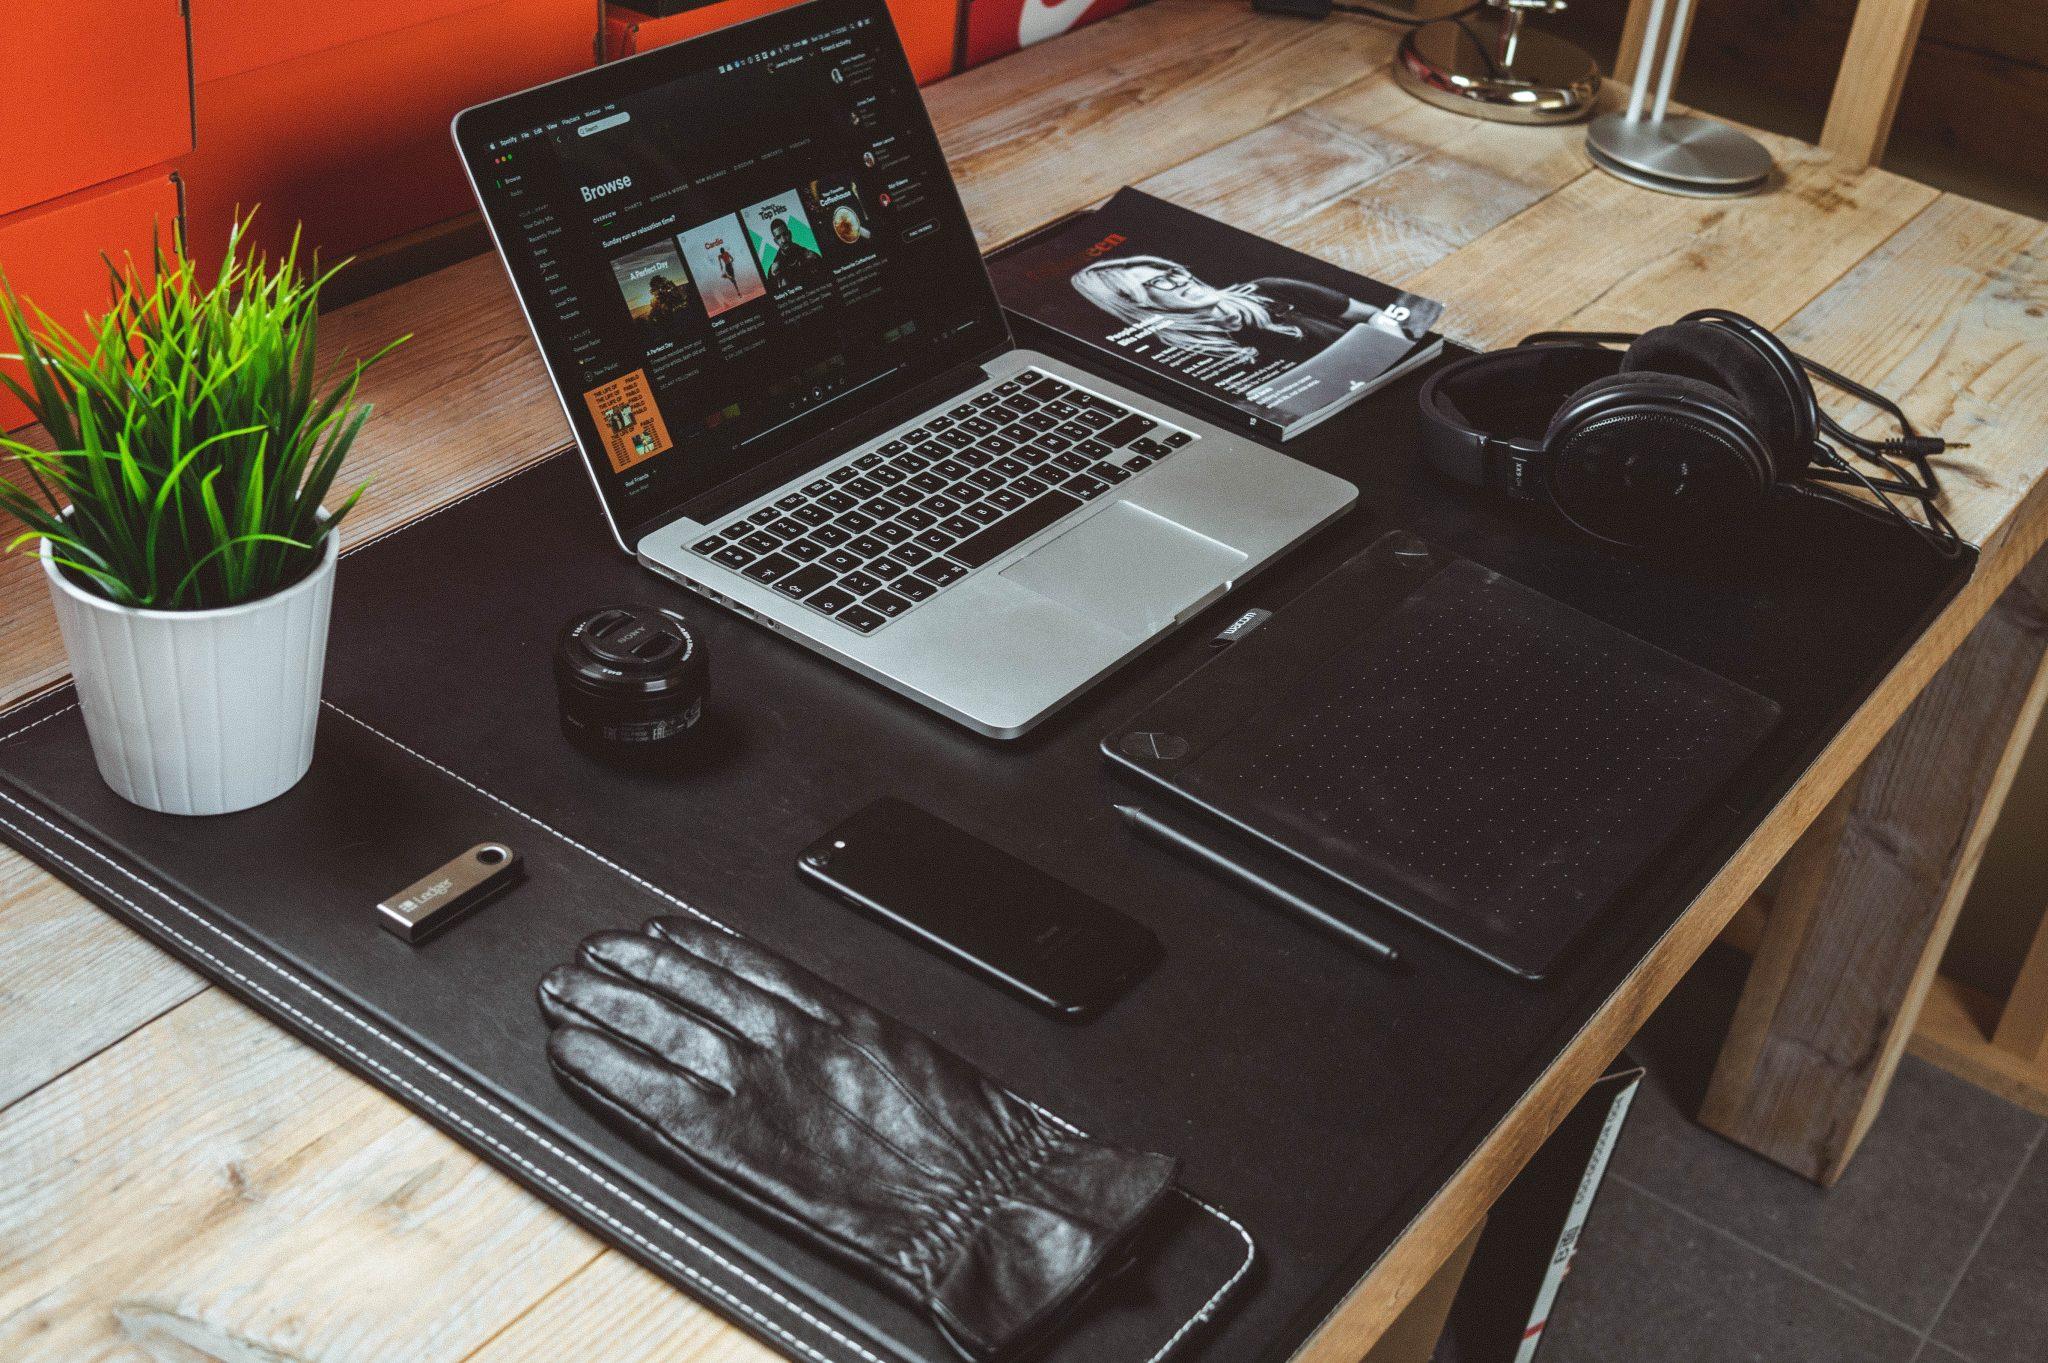 Best 2 In 1 Laptop Black Friday Deals